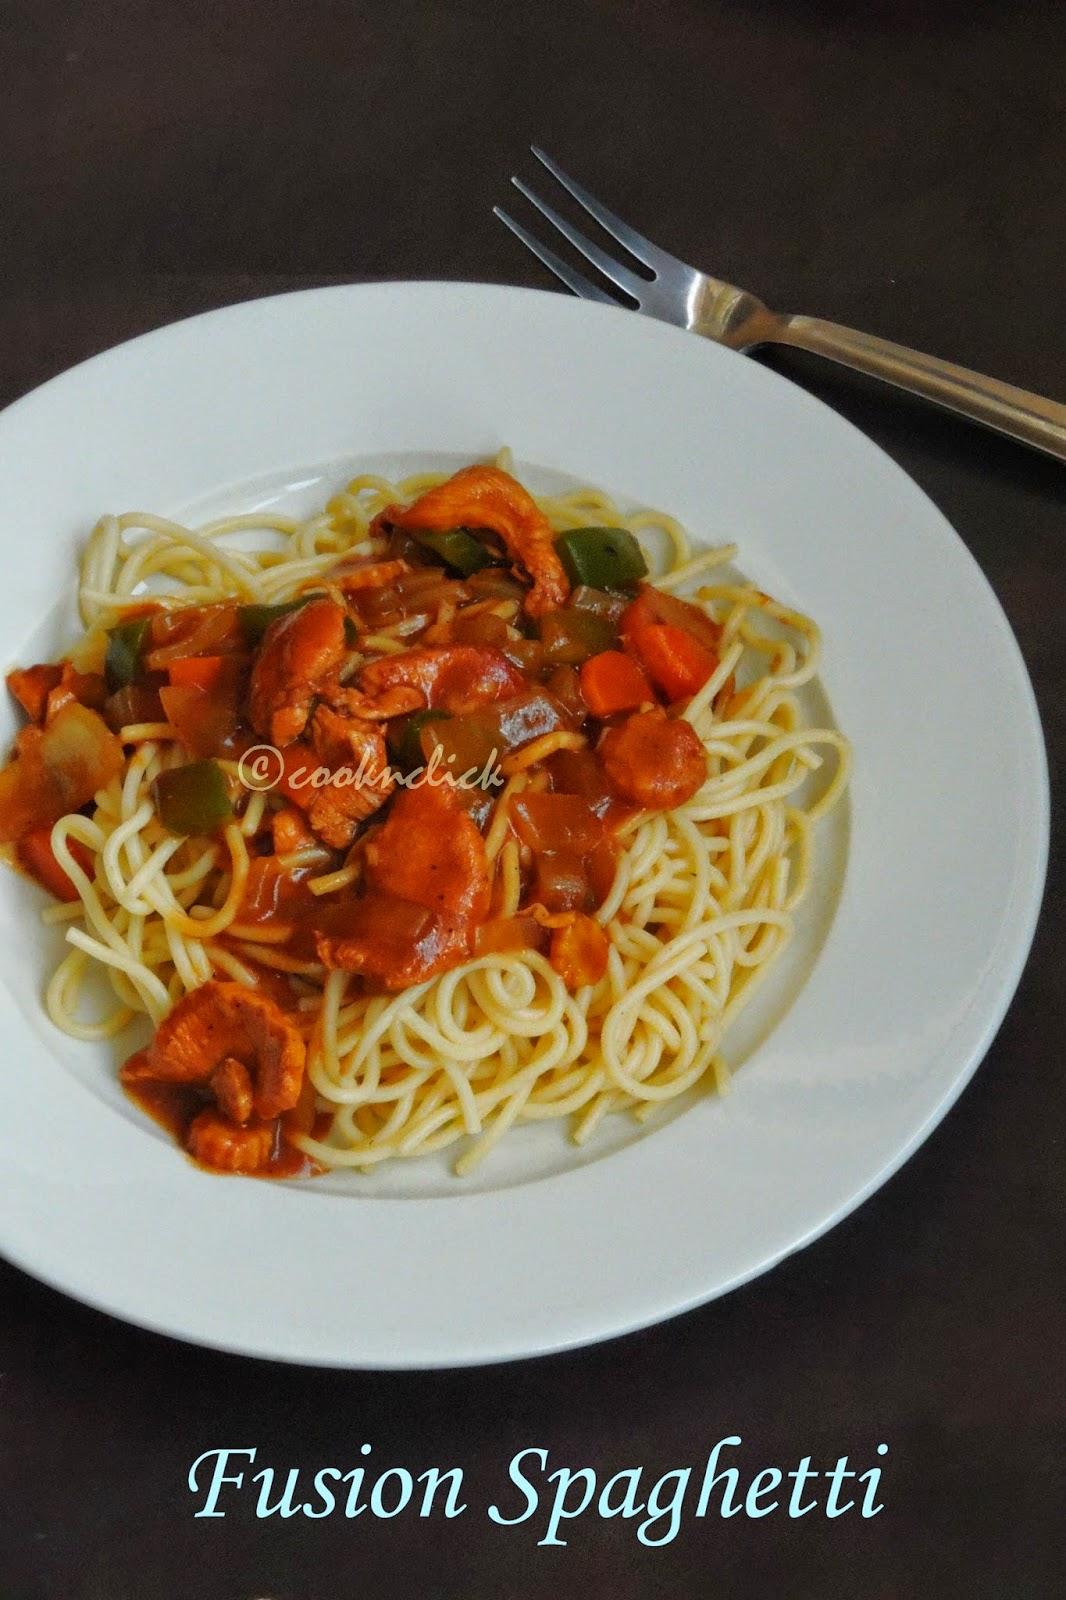 Chinese style spaghetti,fusion spaghetti